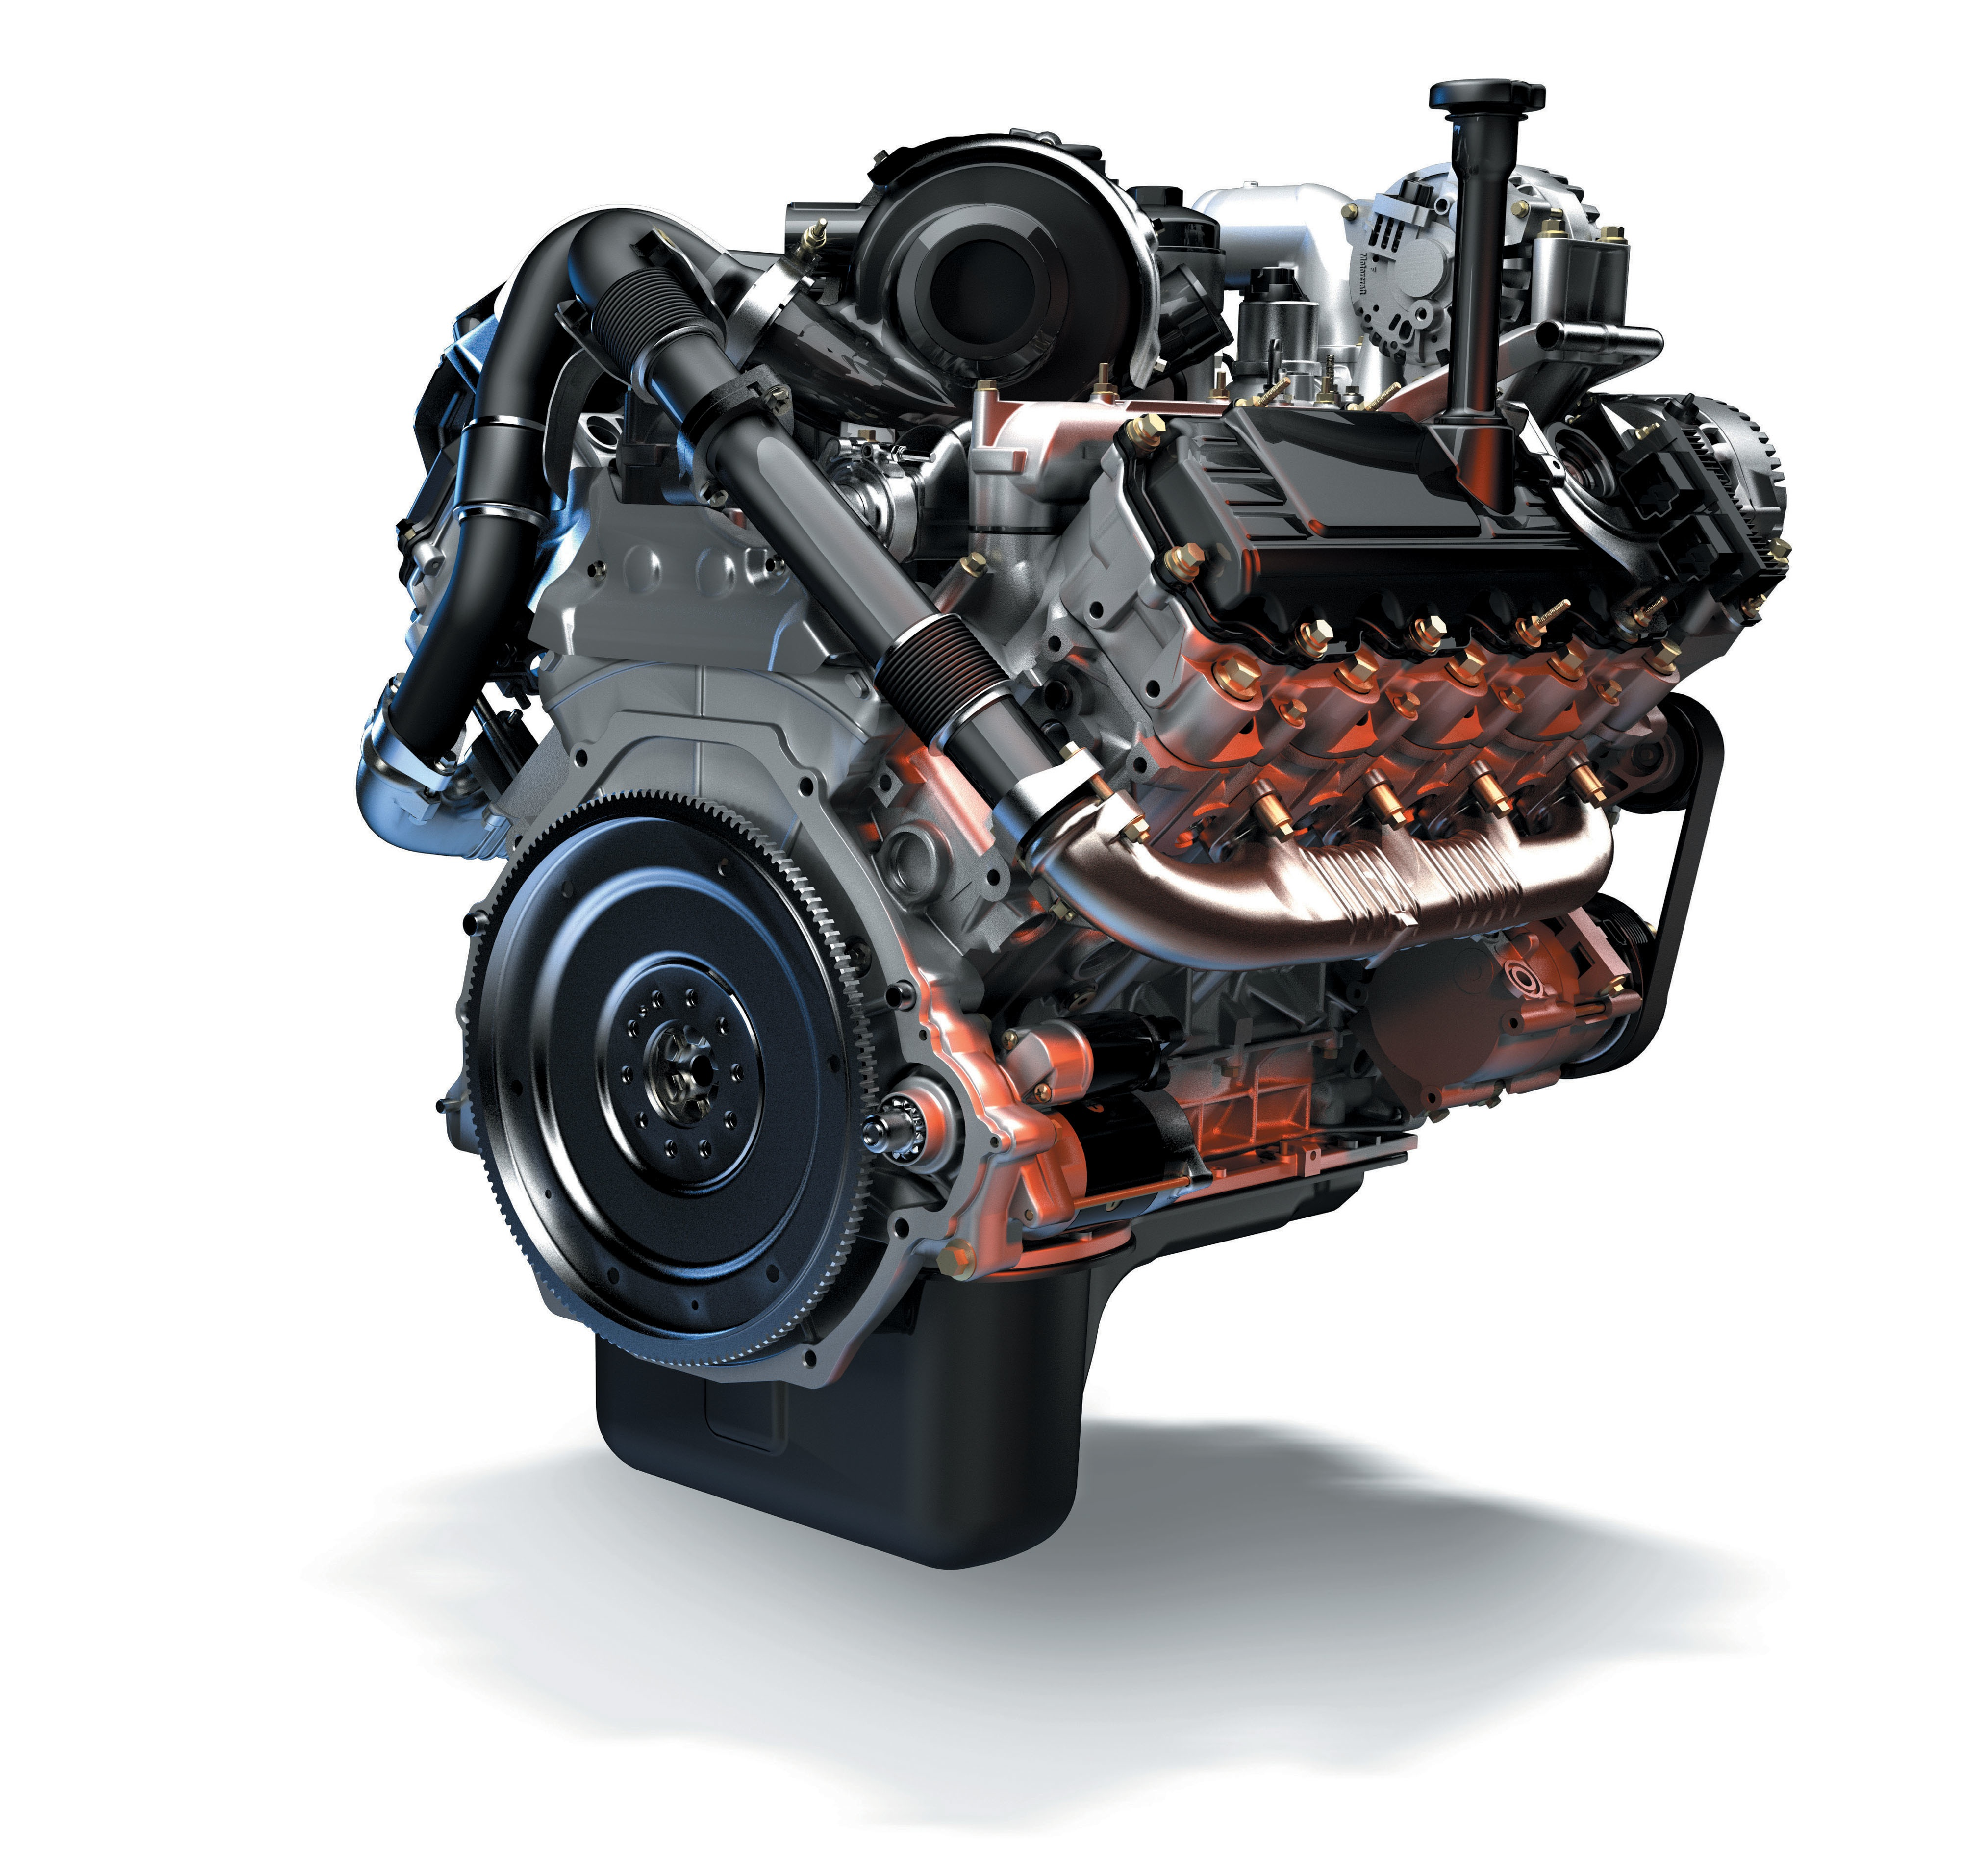 Ford Powerstroke 73 Logo The fordnavistar power stroke 4000x3826